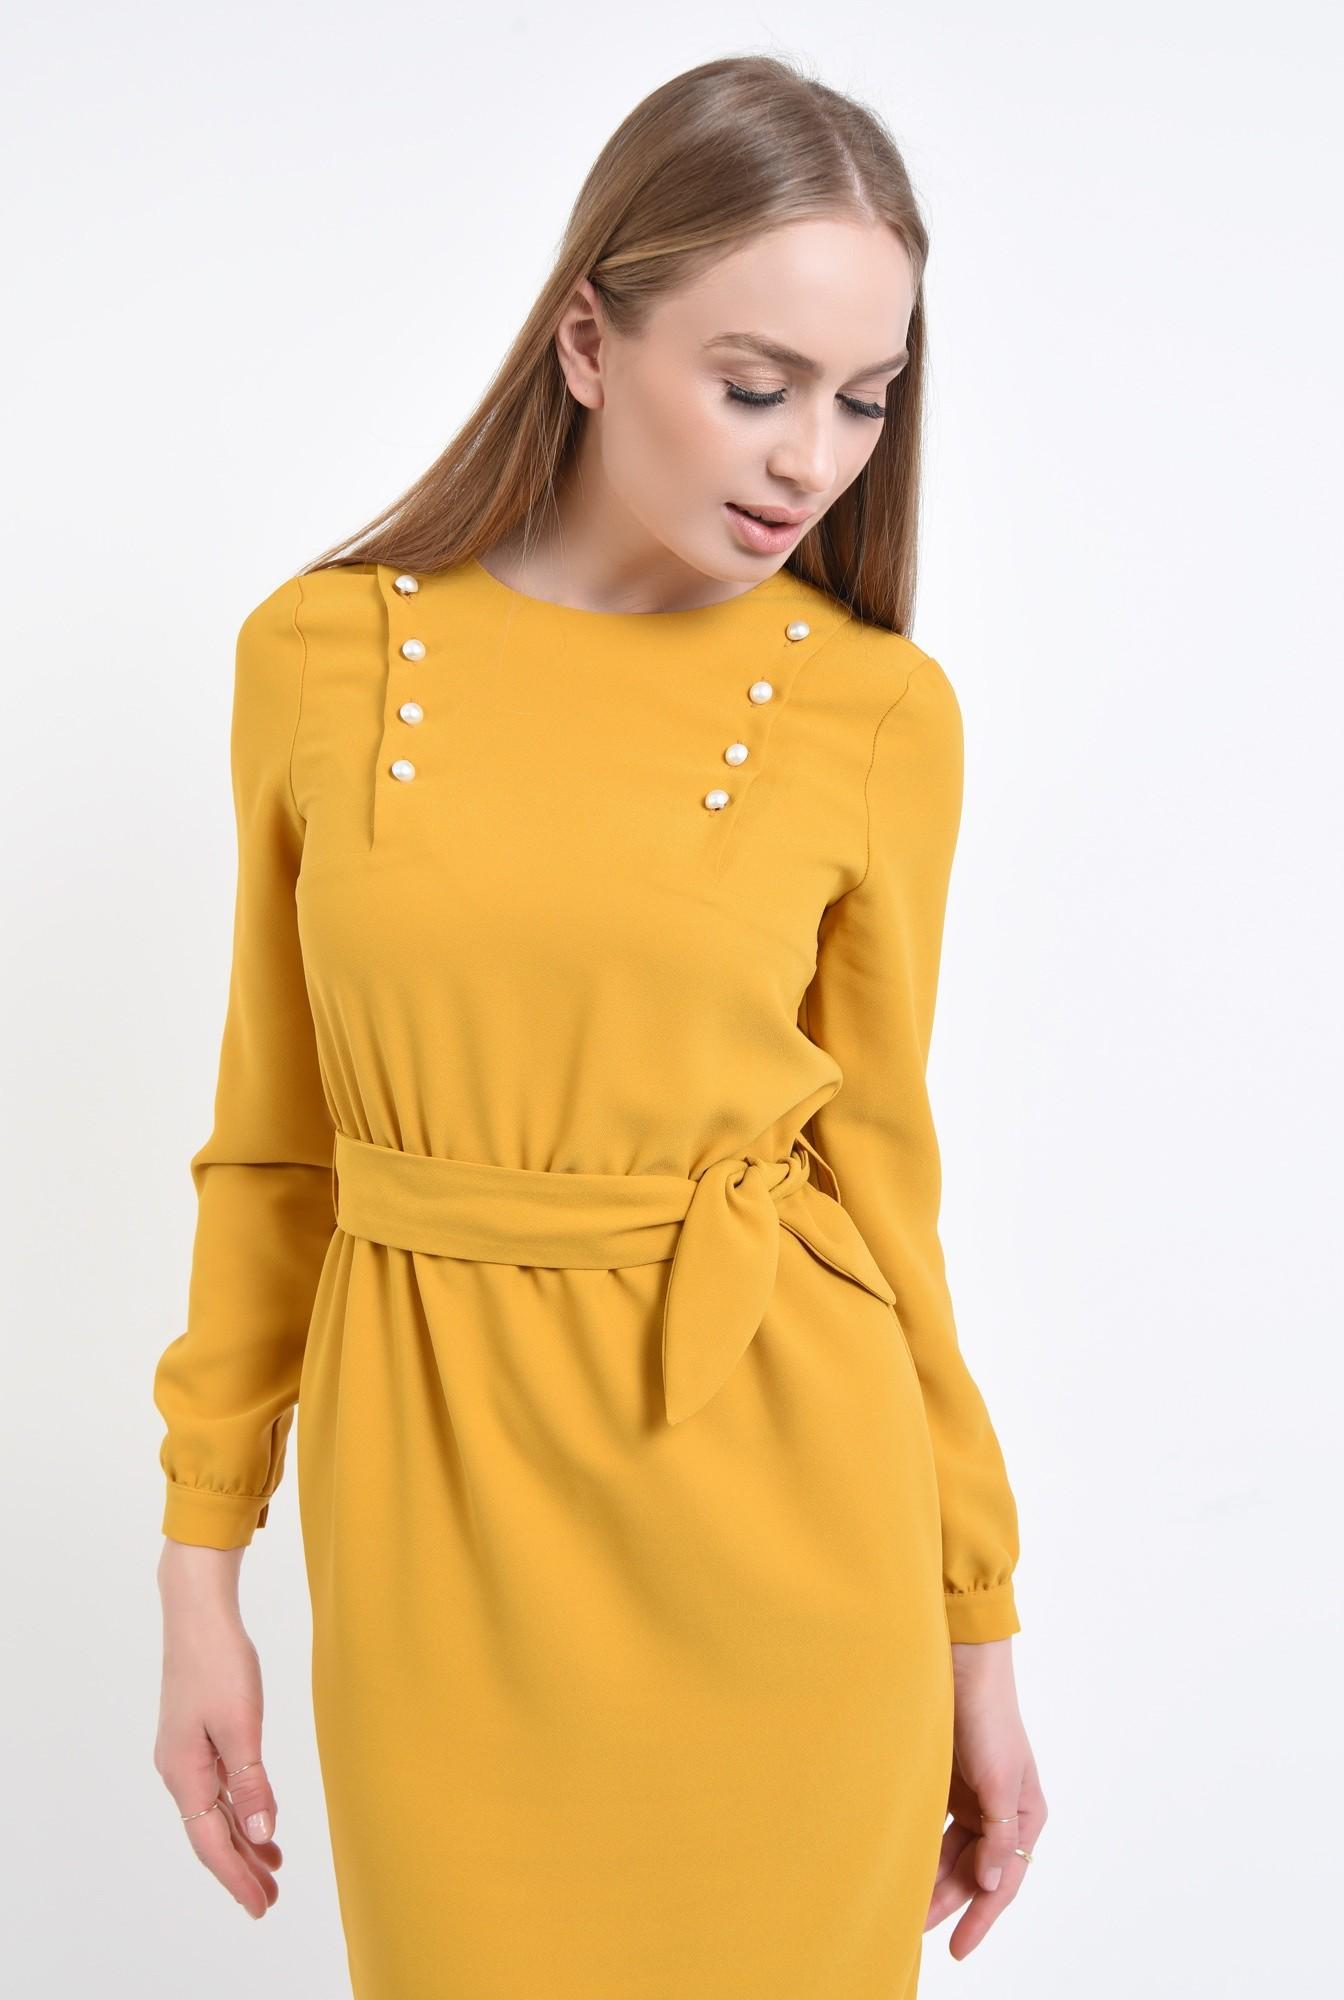 2 - rochie de zi, conica, galben, mustar, perle